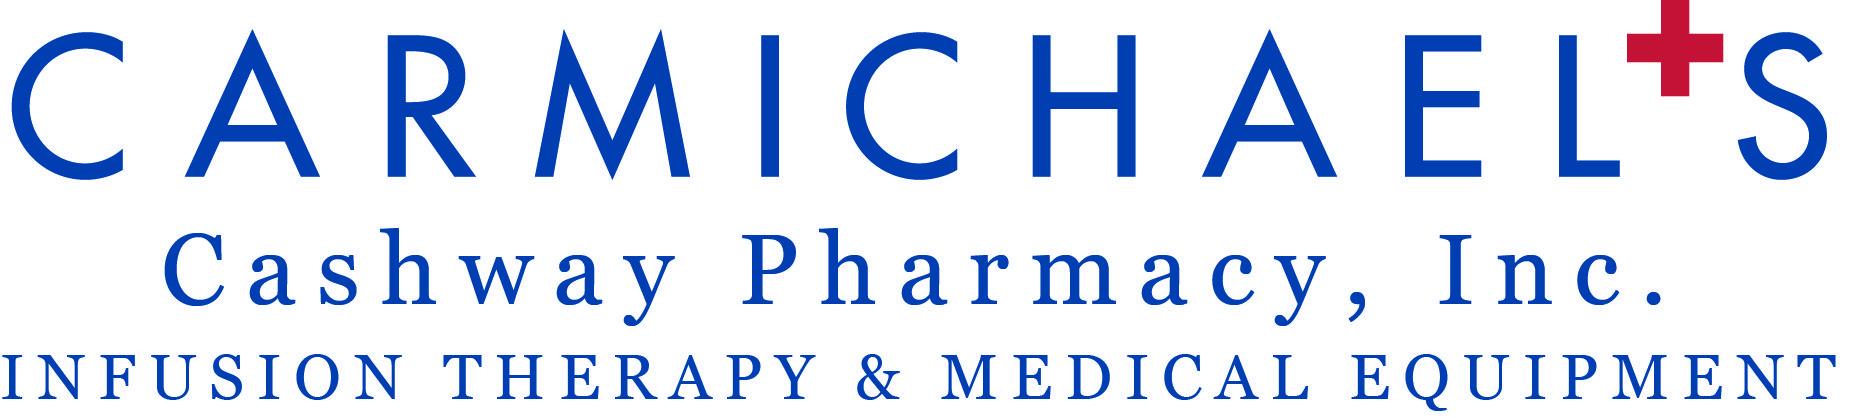 Carmichael's Cashway Pharmacy